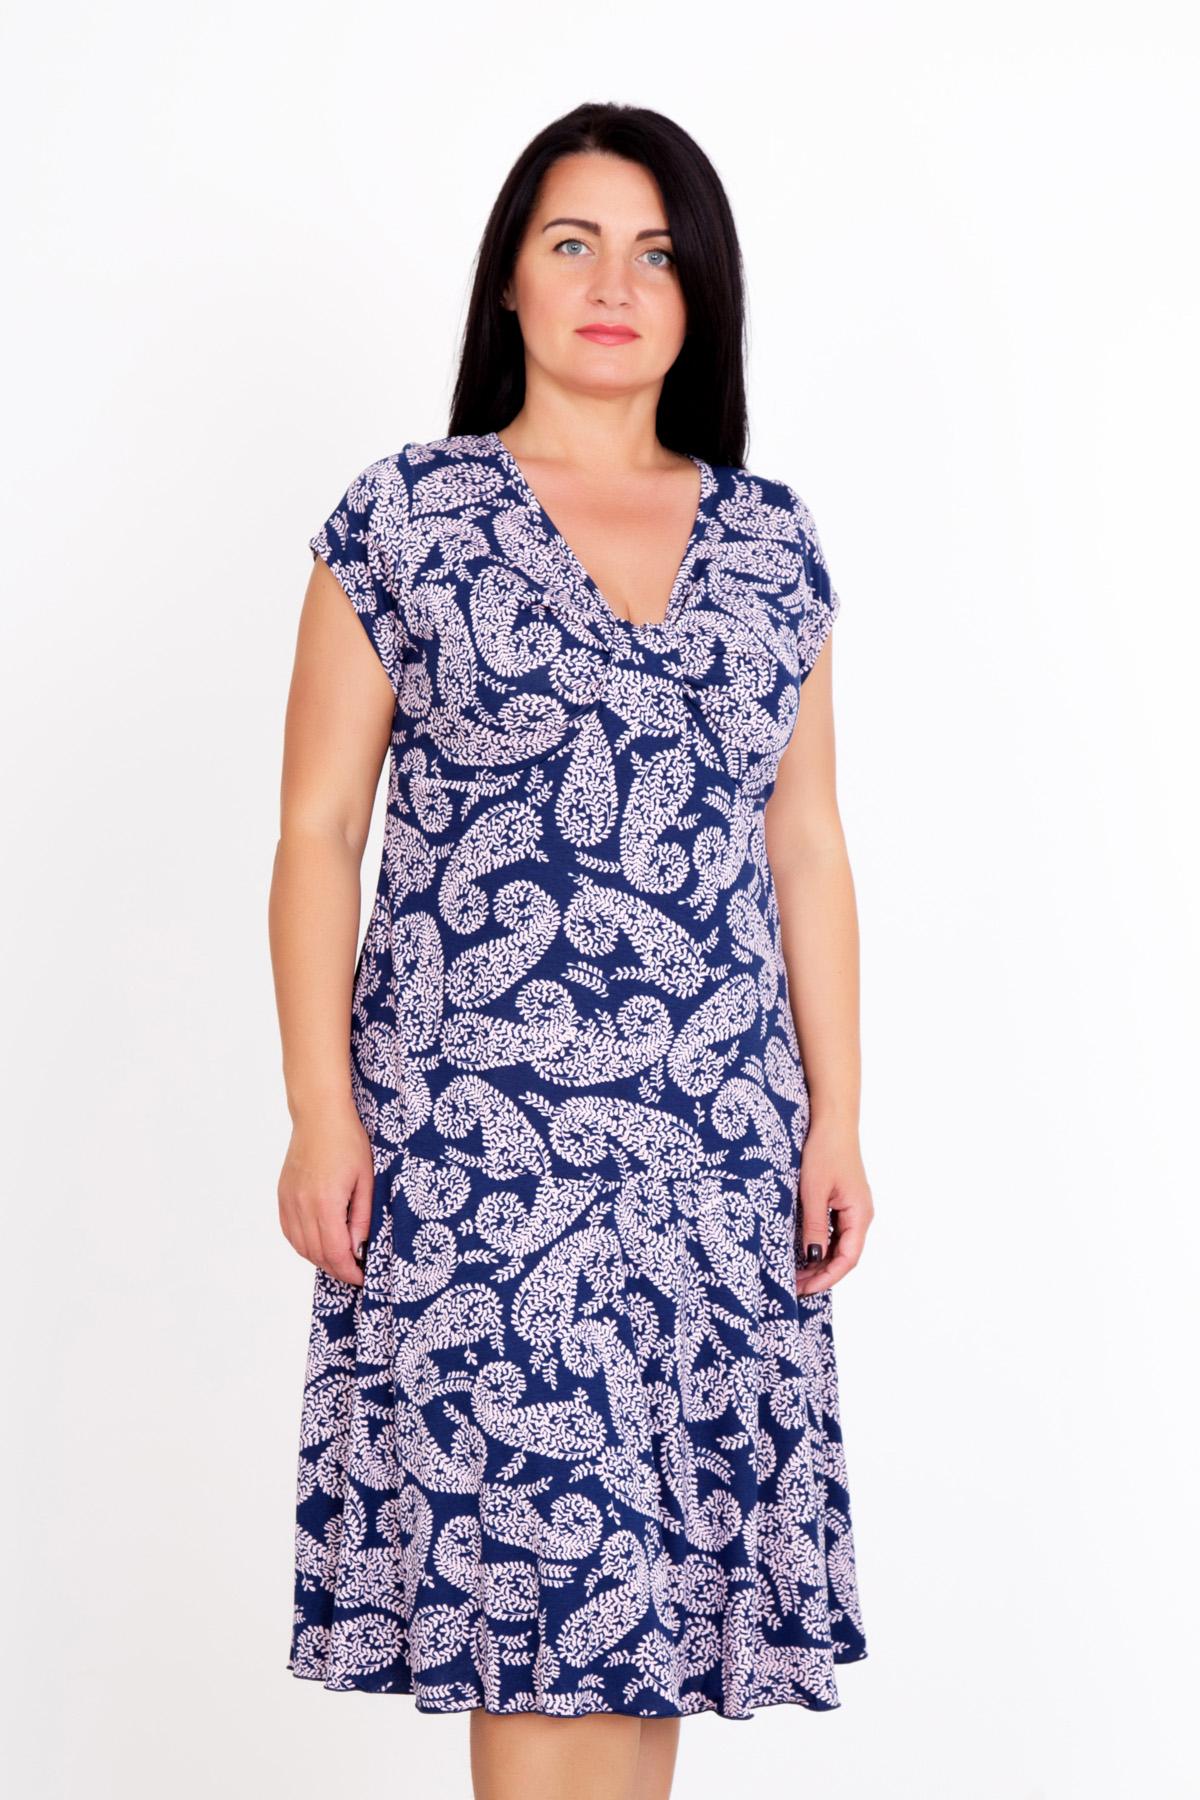 Женское платье Прелесть, размер 58Платья, туники<br>Обхват груди:116 см<br>Обхват талии:97 см<br>Обхват бедер:124 см<br>Рост:167 см<br><br>Тип: Жен. платье<br>Размер: 58<br>Материал: Вискоза